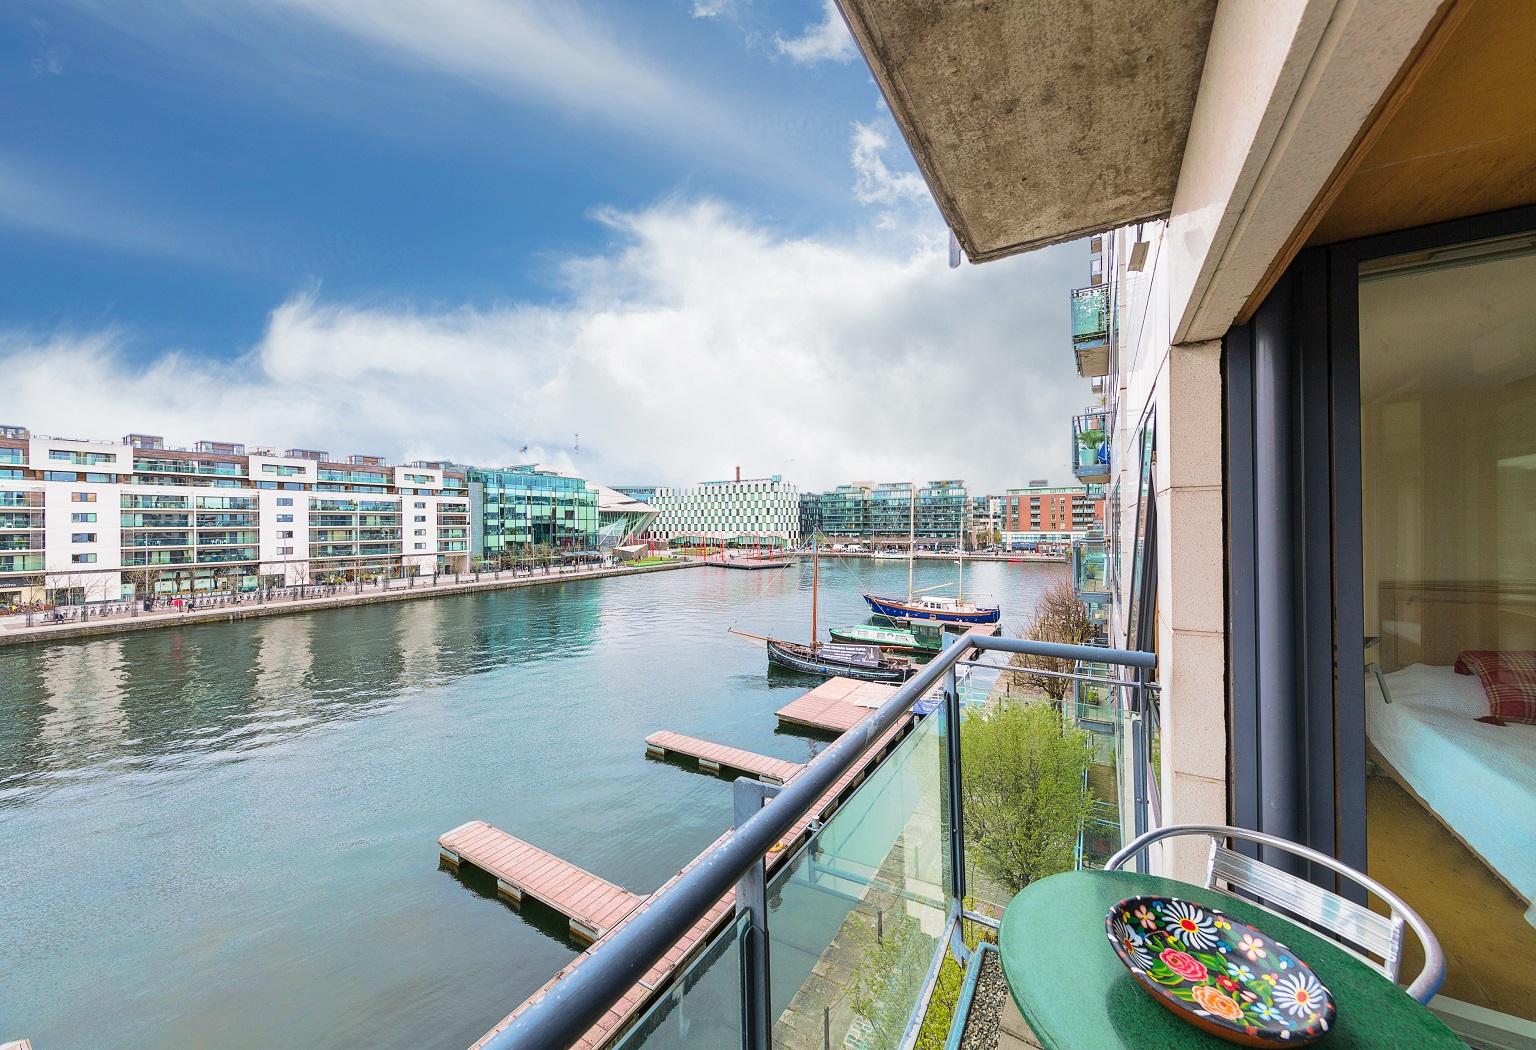 11 The Locks, Grand Canal Dock, Dublin 4